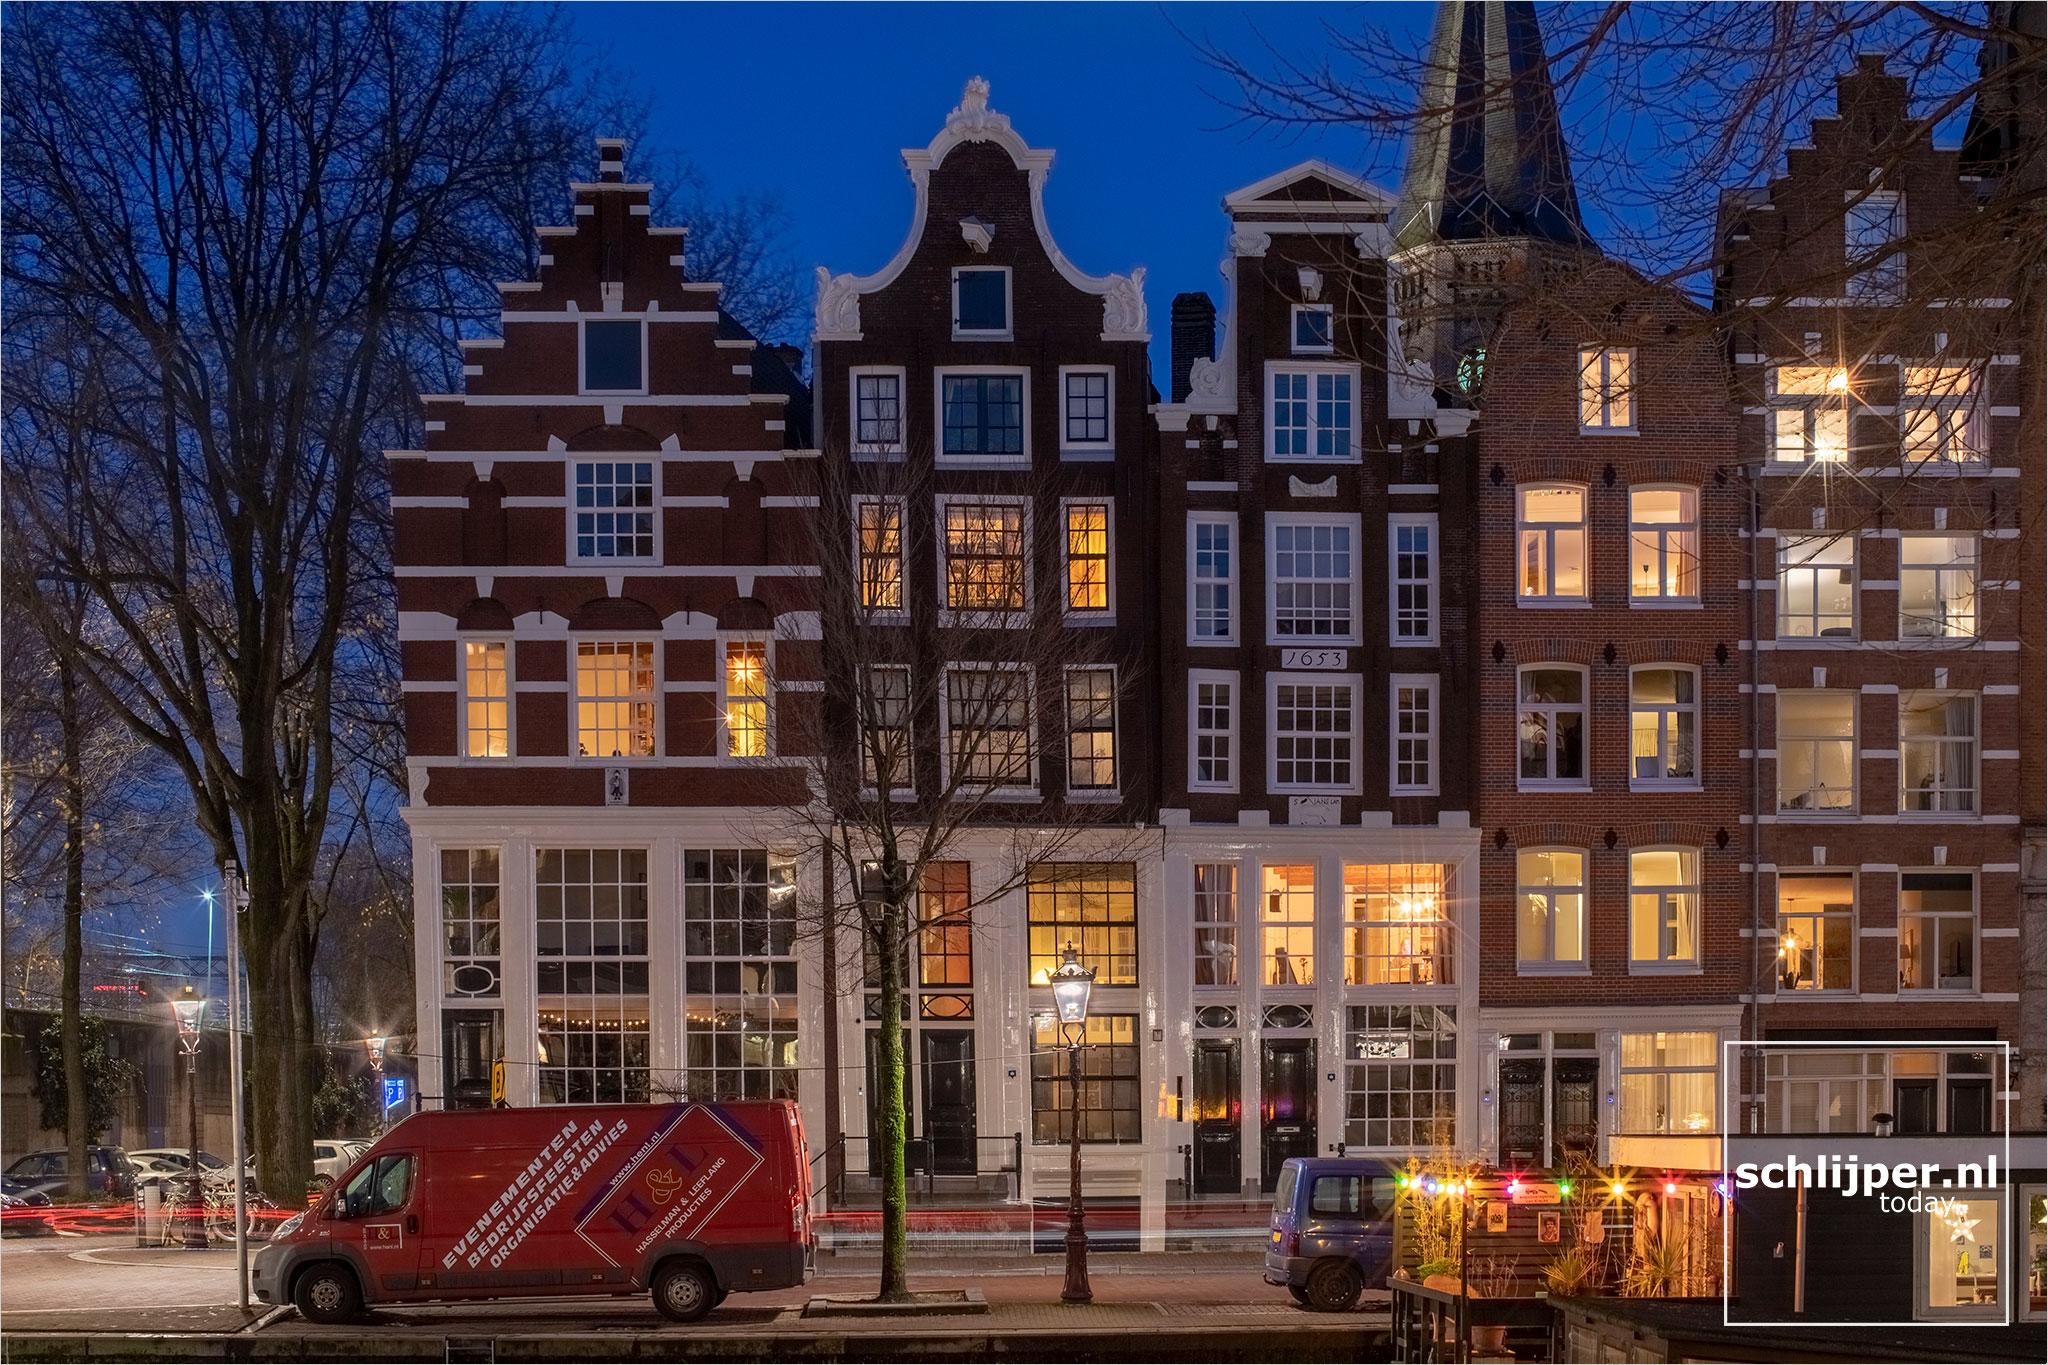 The Netherlands, Amsterdam, 17 december 2020